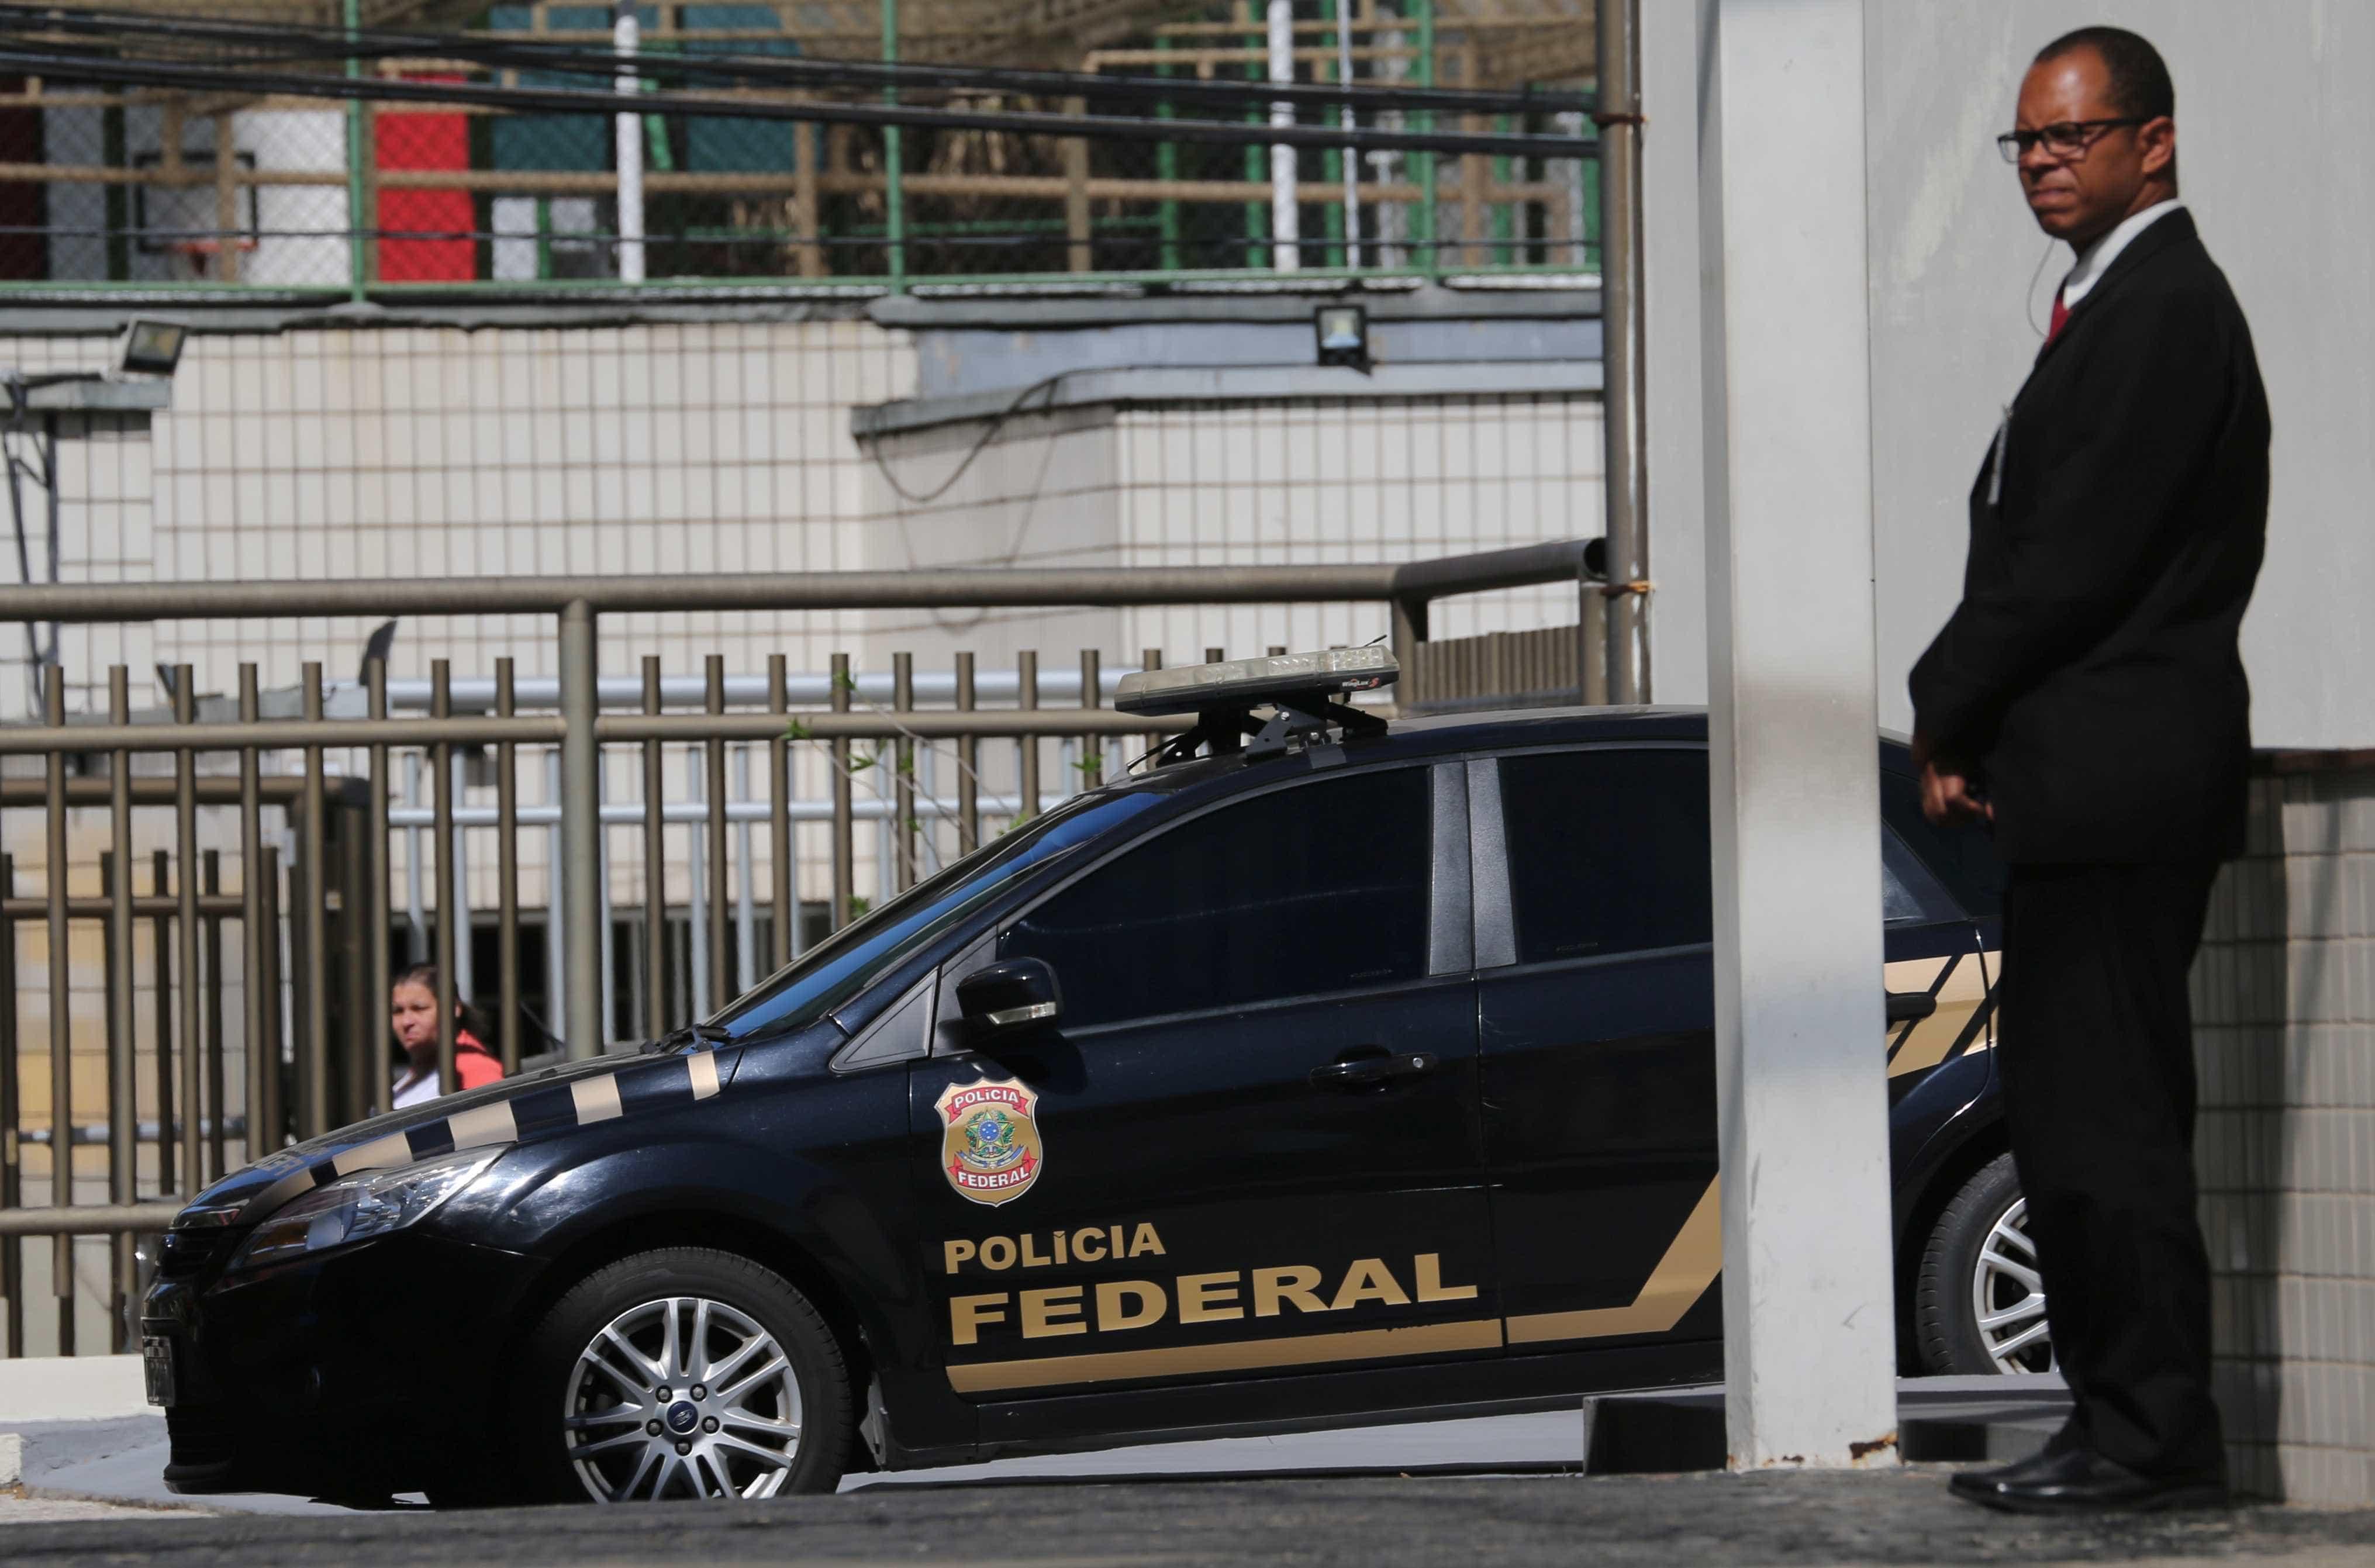 Polícia Federal rastreia dados financeiros de esfaqueador de Bolsonaro